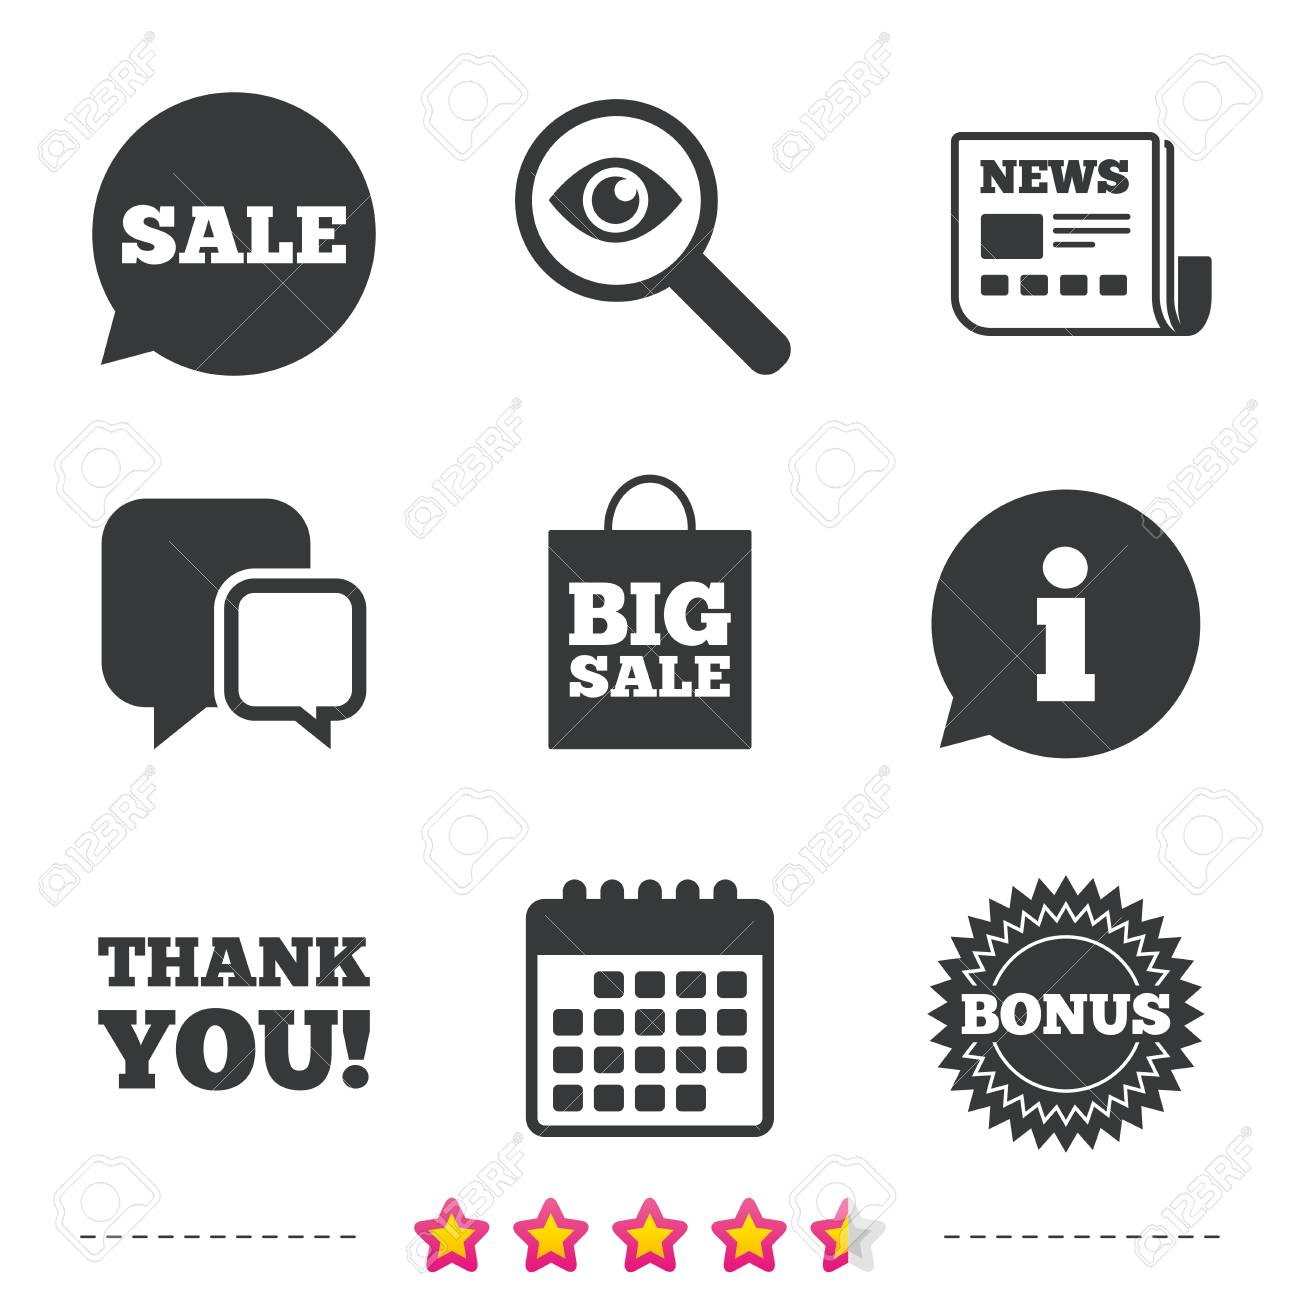 Sale Speech Bubble Icon Thank You Symbol Bonus Star Circle